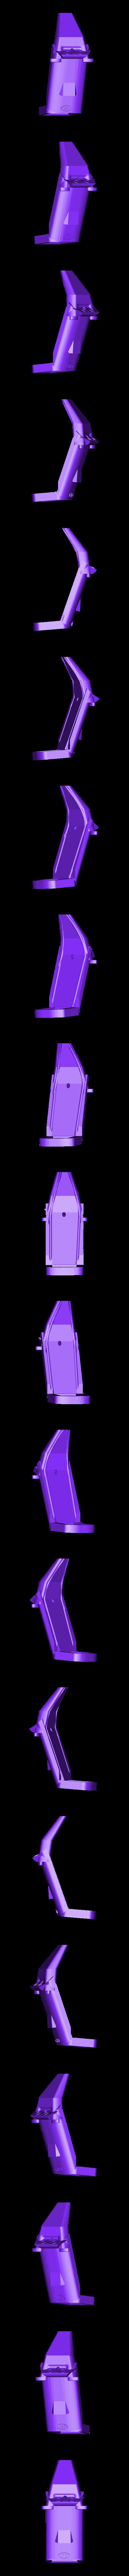 kappen.stl Download free STL file trick (custom) • 3D printer model, jasperbaudoin